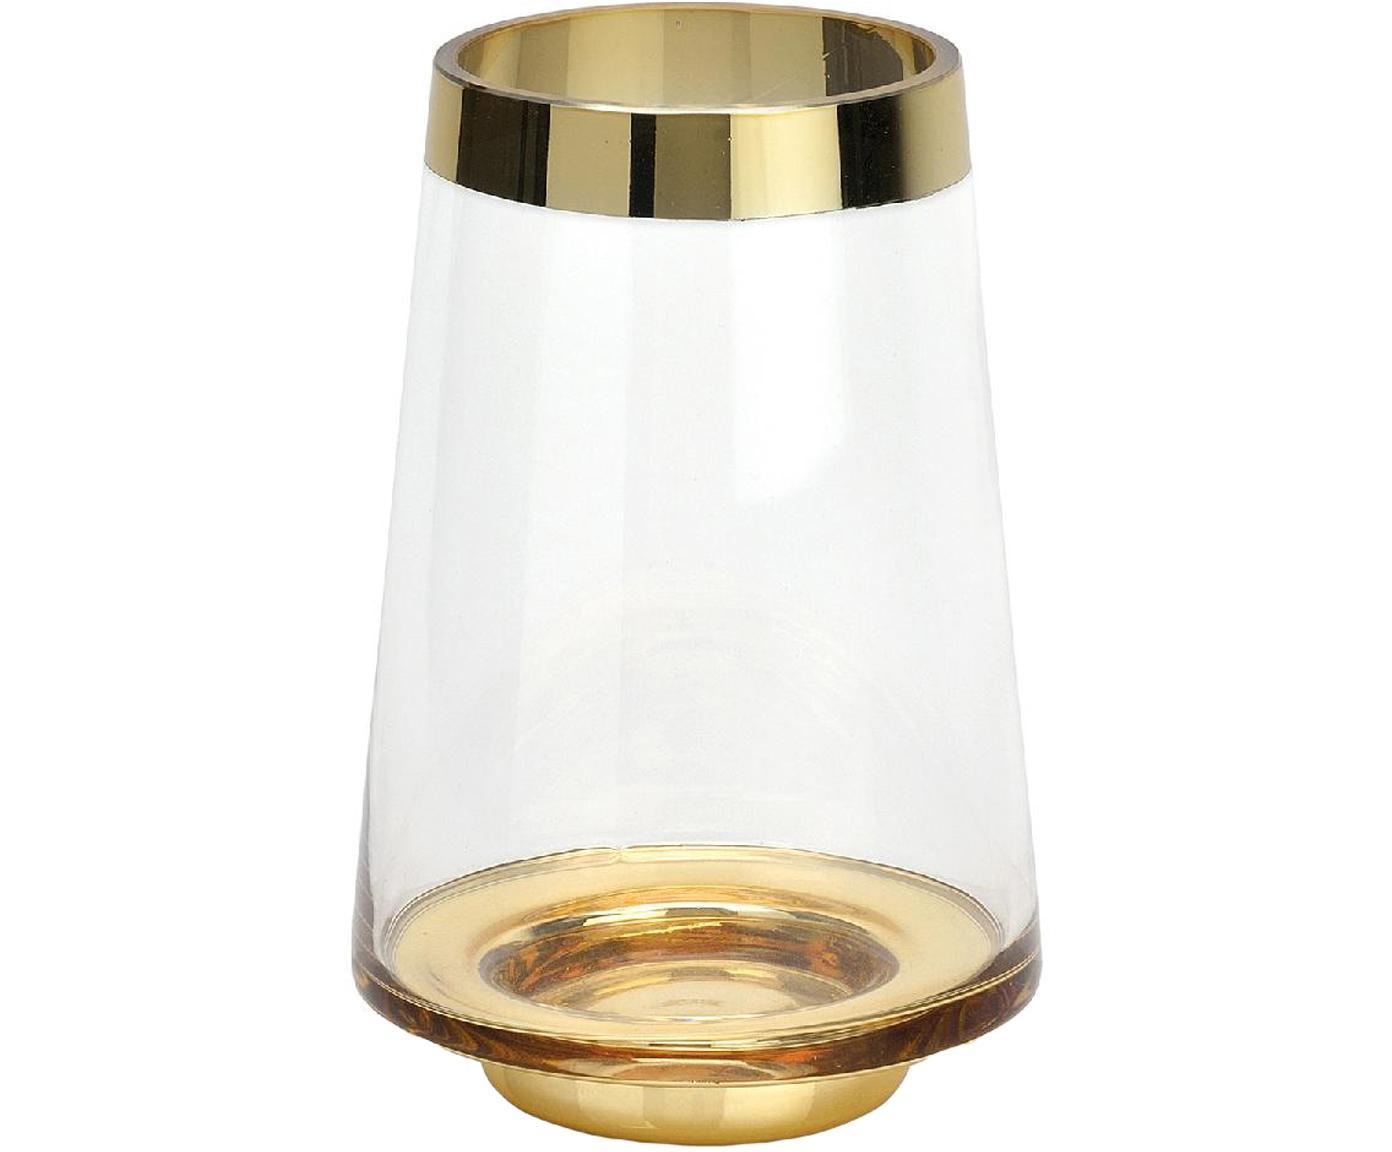 Glas-Vase Lydia mit lackiertem Rand, Glas, Transparent, Goldfarben, Ø 13 x H 20 cm